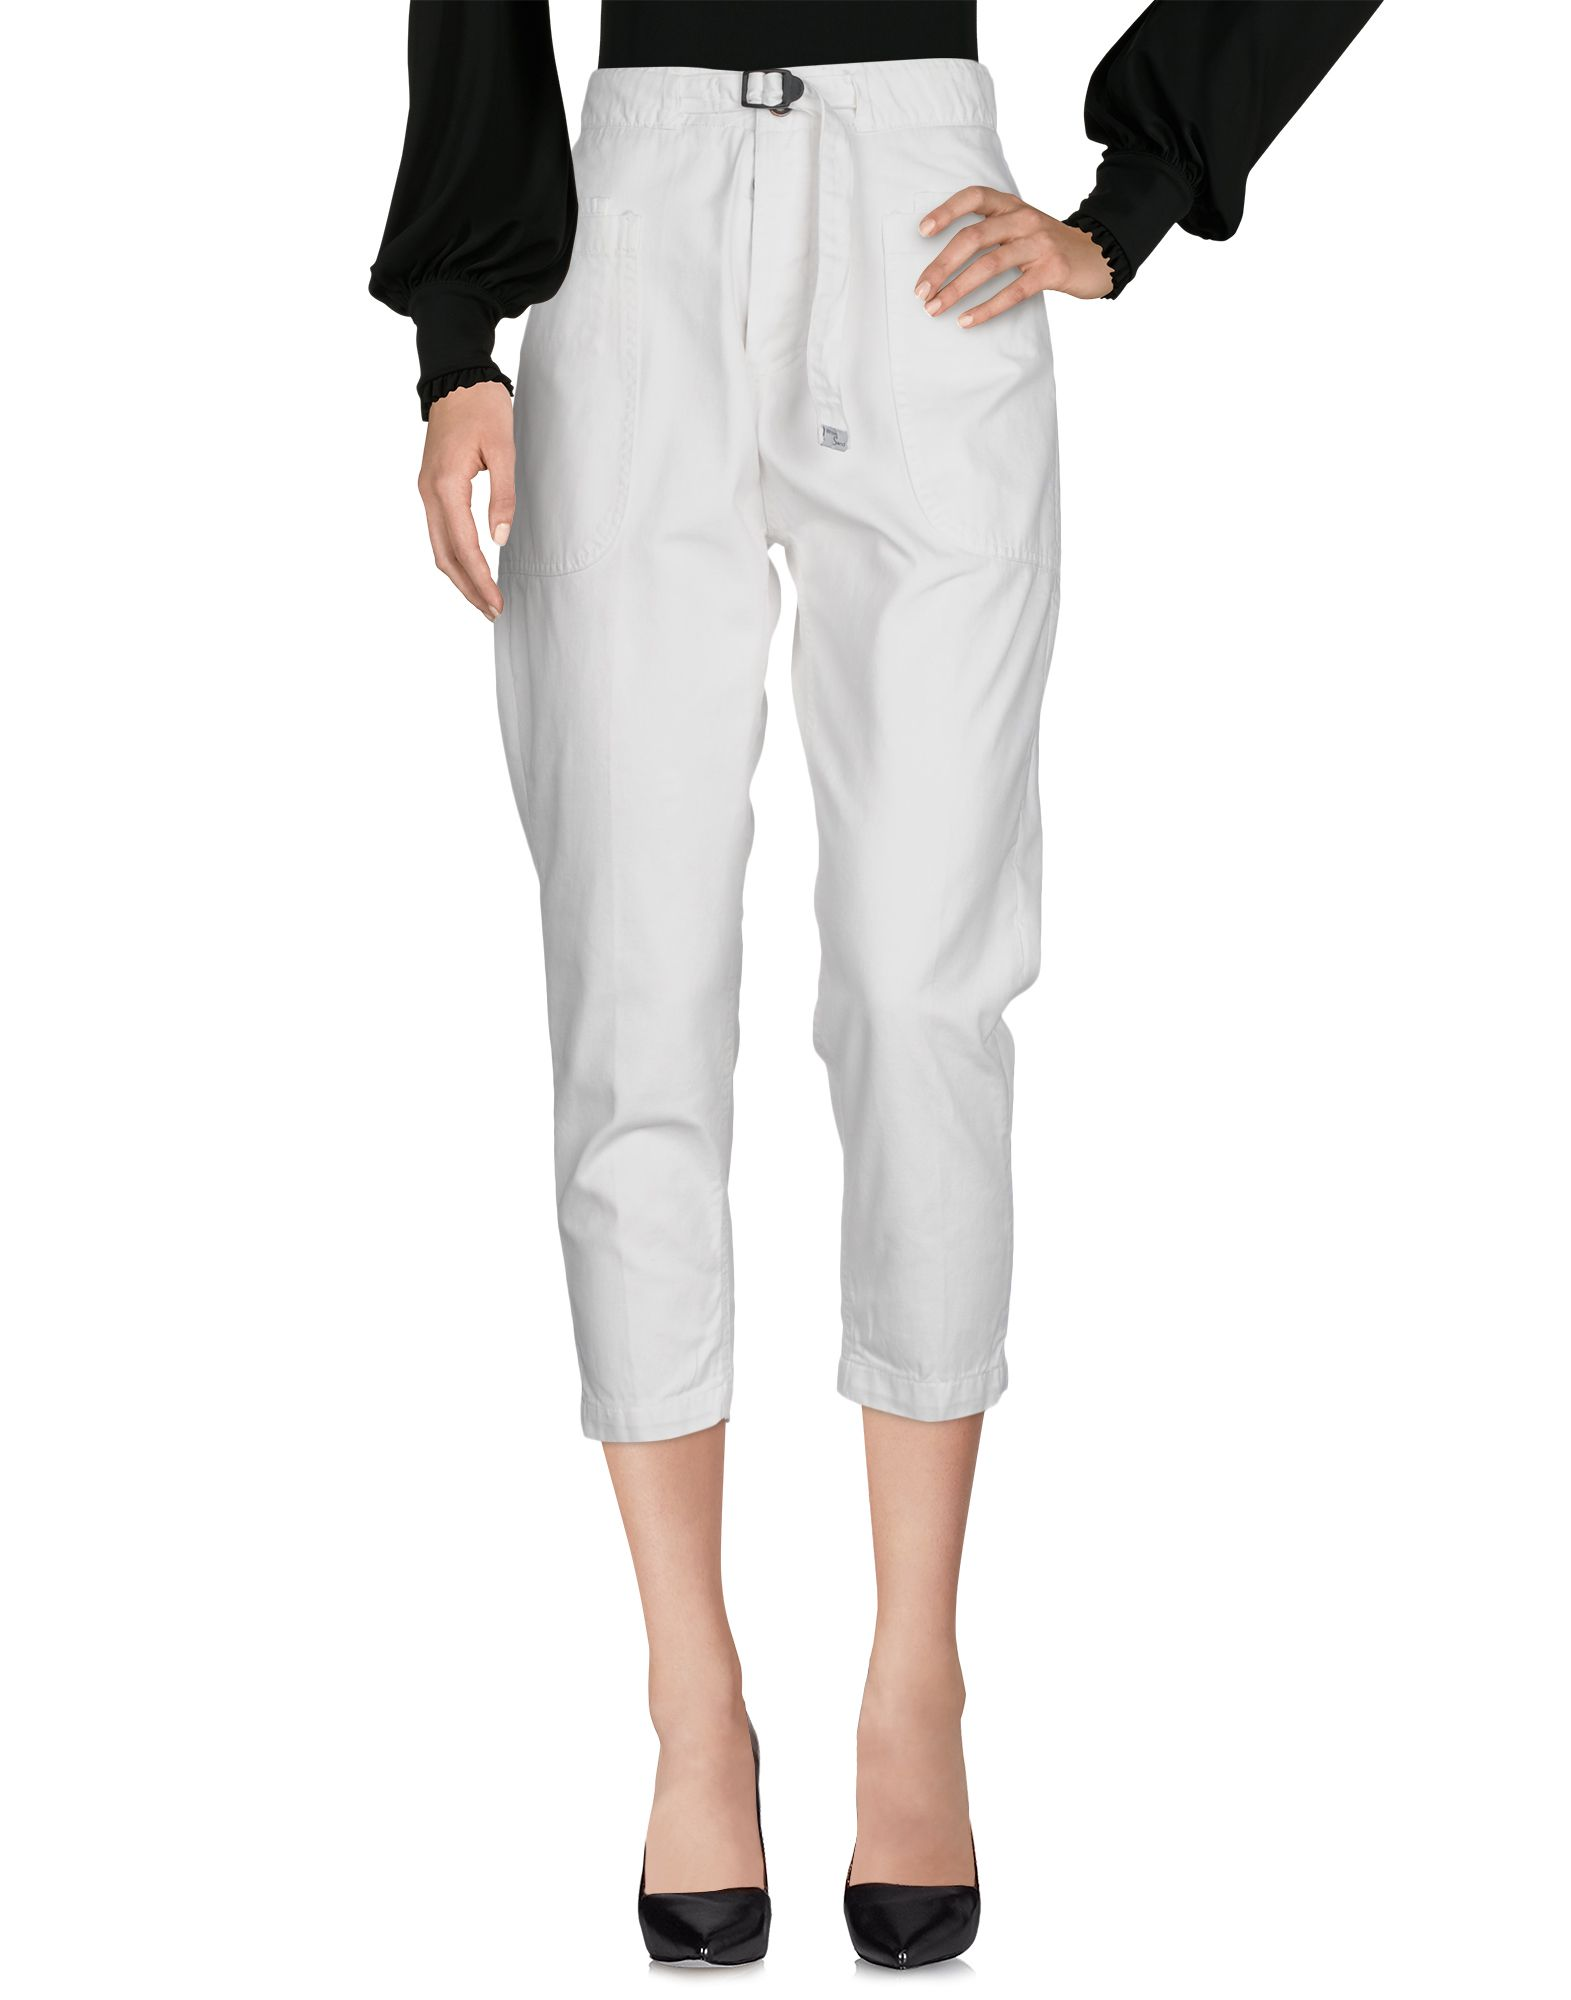 WHITE SAND 88 Повседневные брюки white sand 88 бермуды